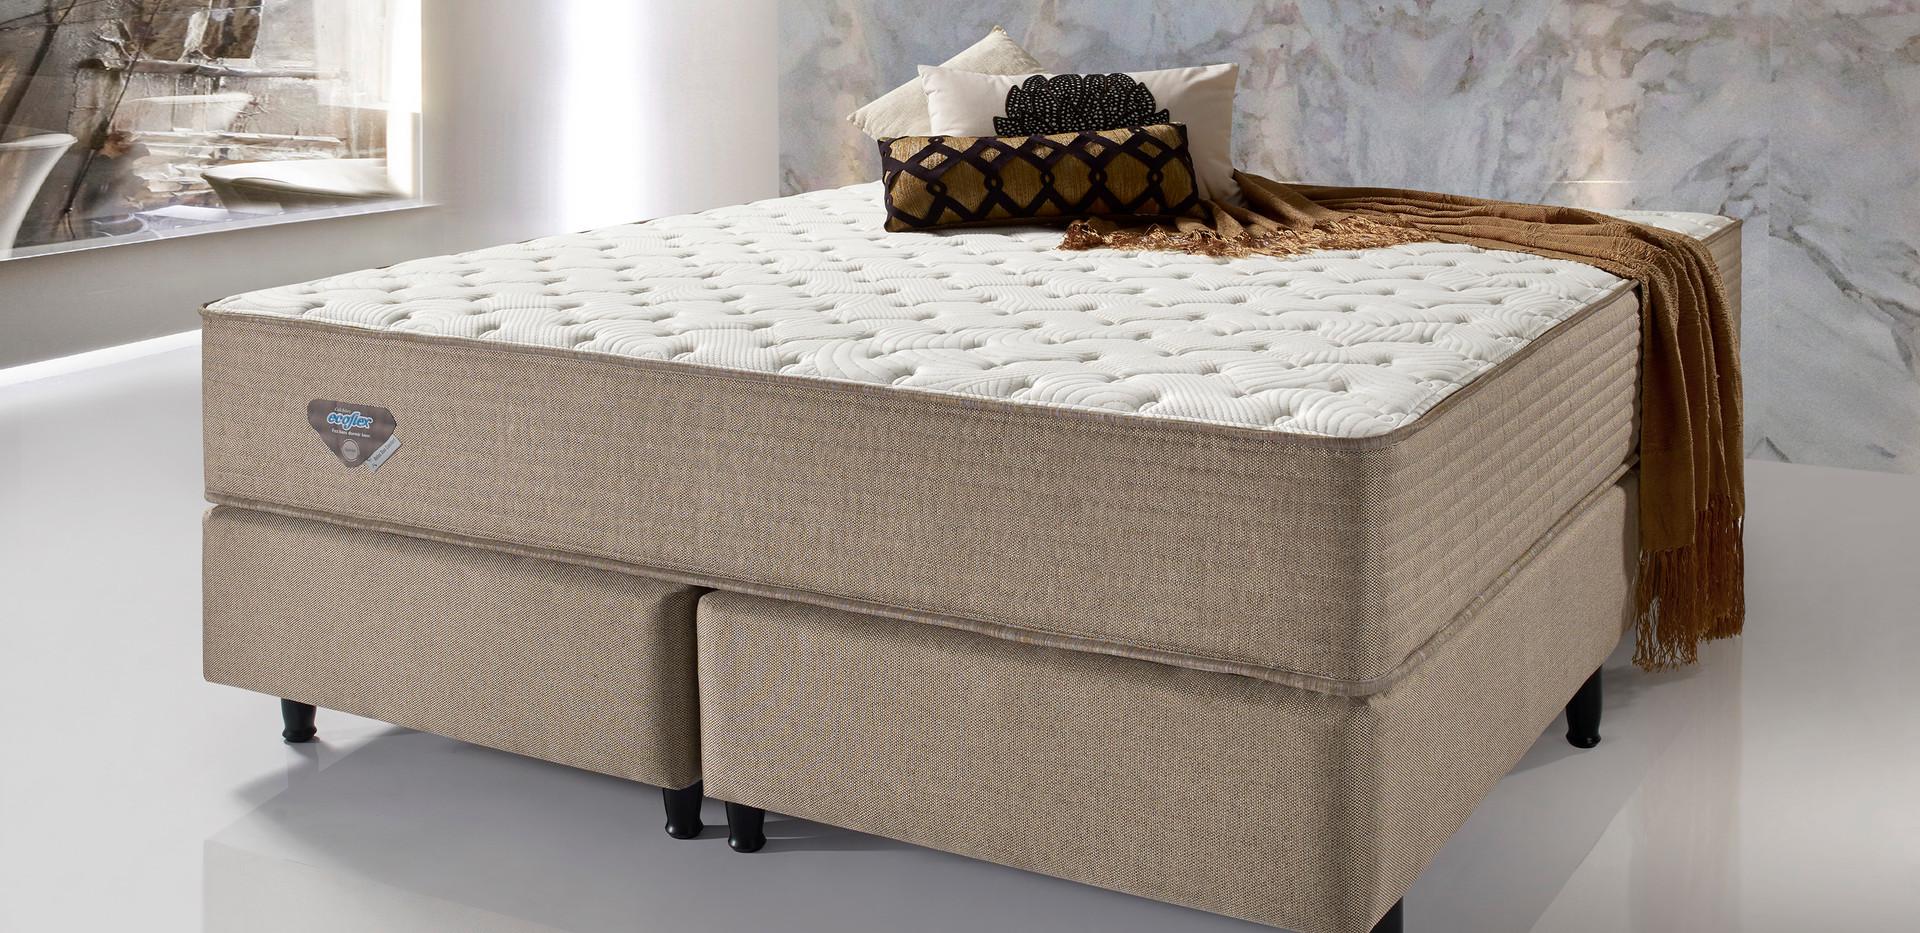 7 - Ecoflex4393 (SAN) Relax Dou Comfort.